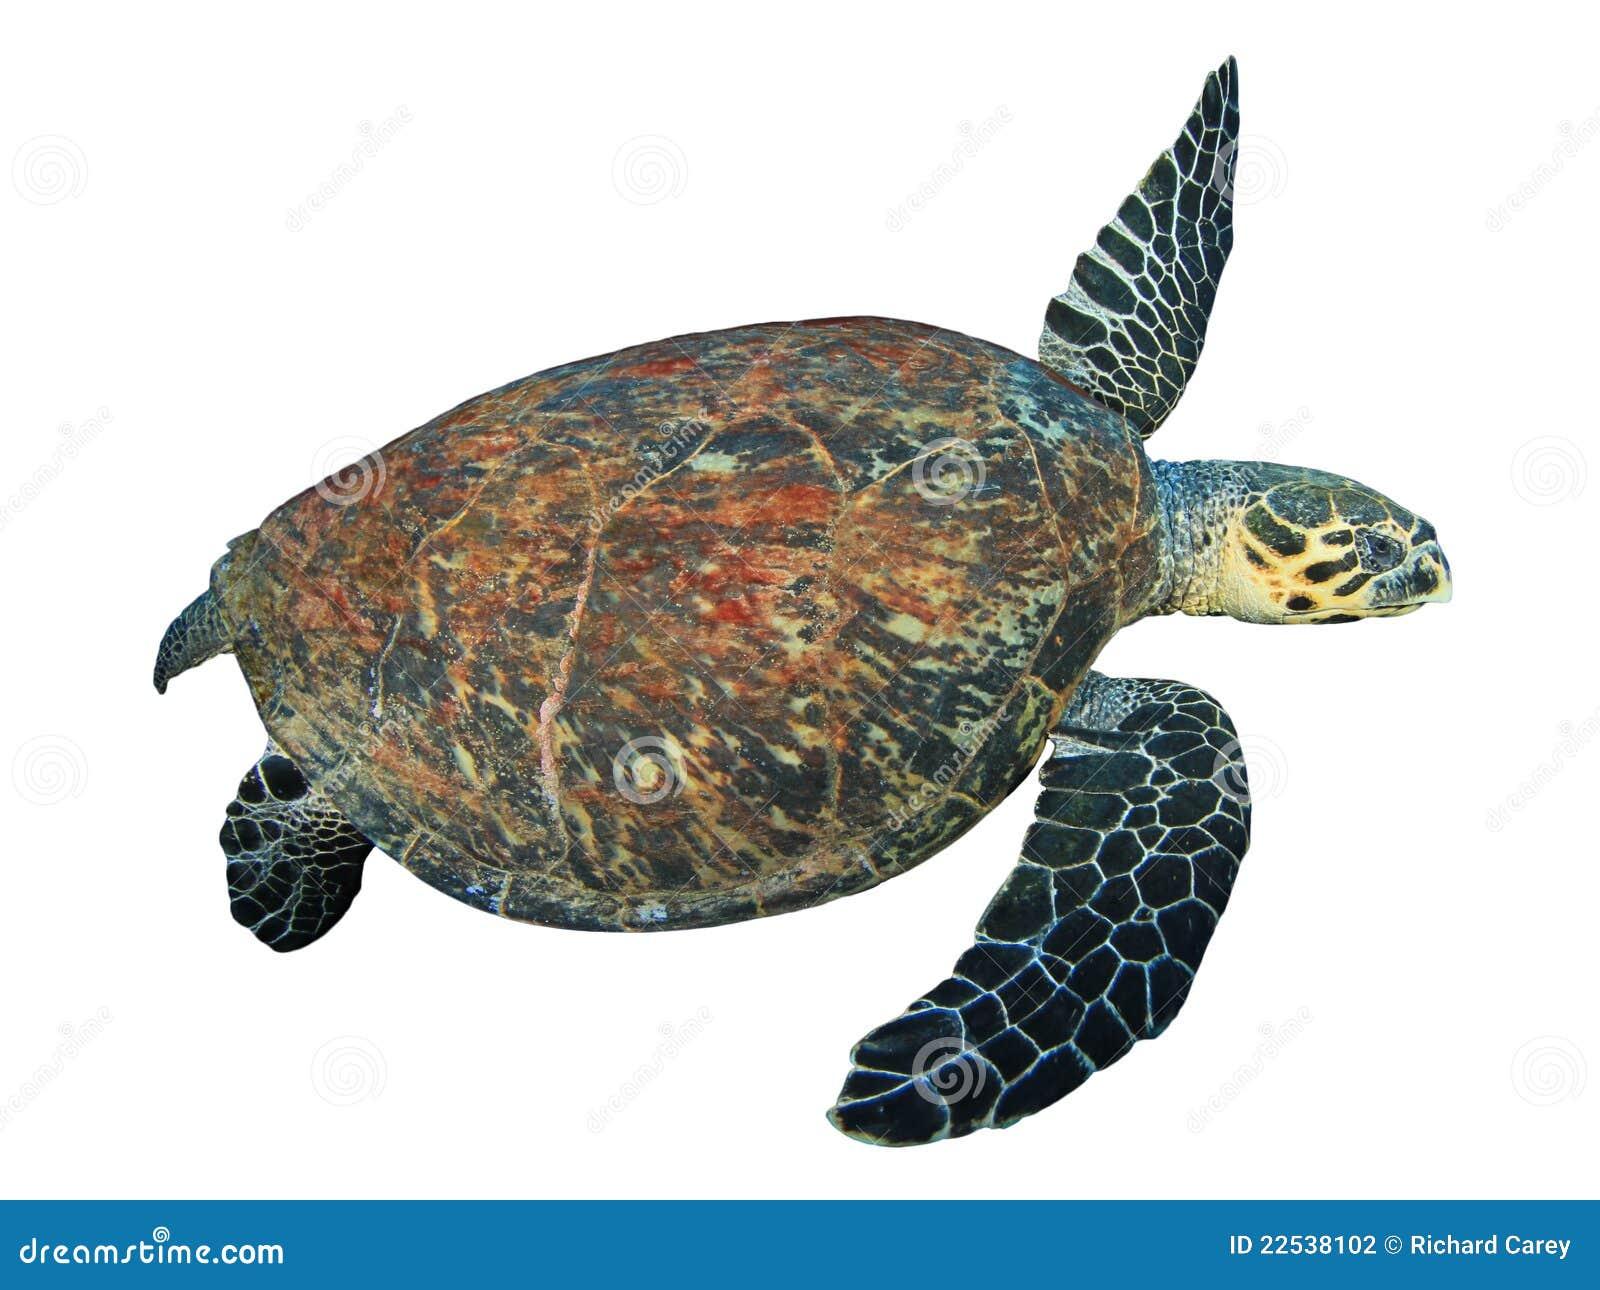 turtle white background - photo #24